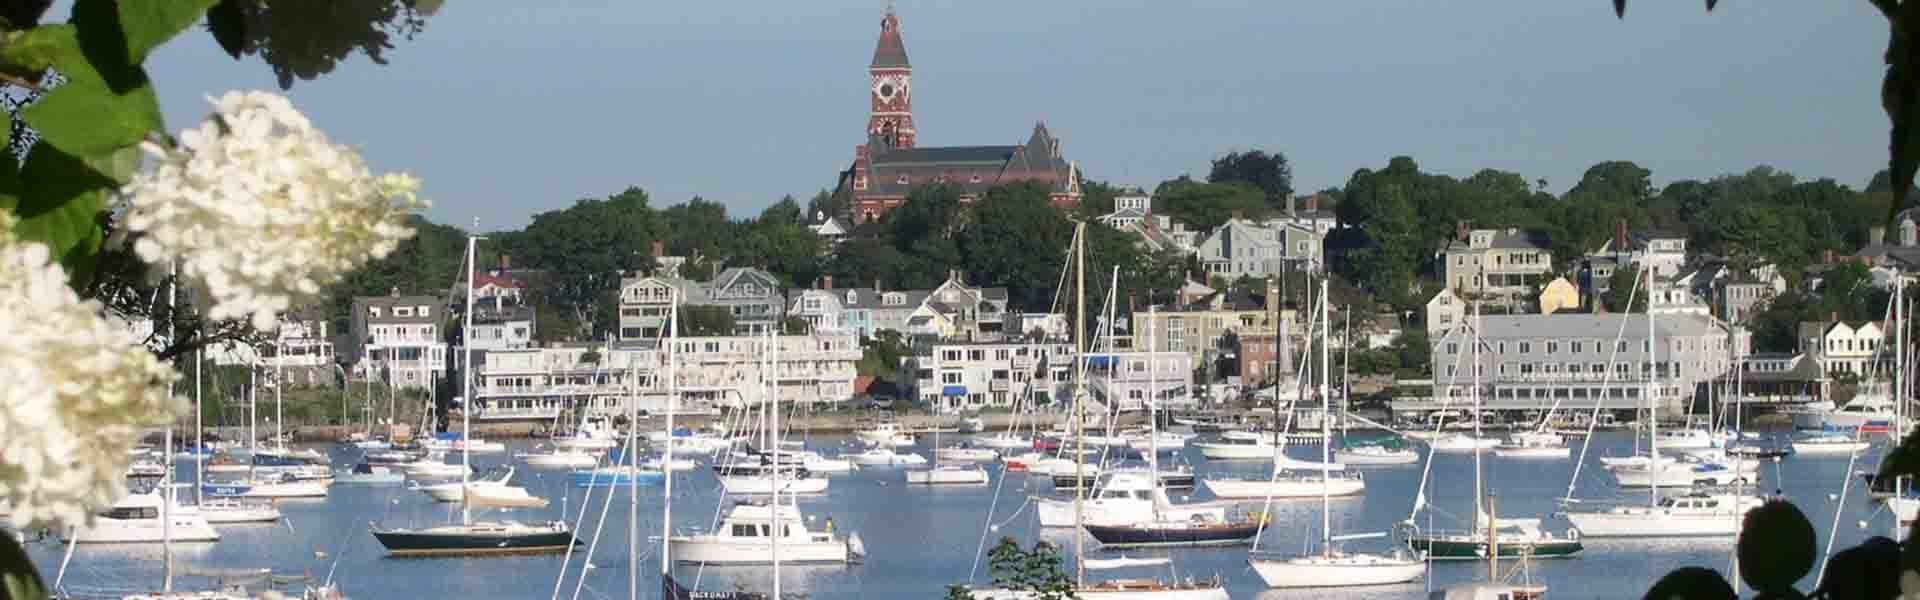 Marblehead High School Massachusetts USA Boston Banner 2019